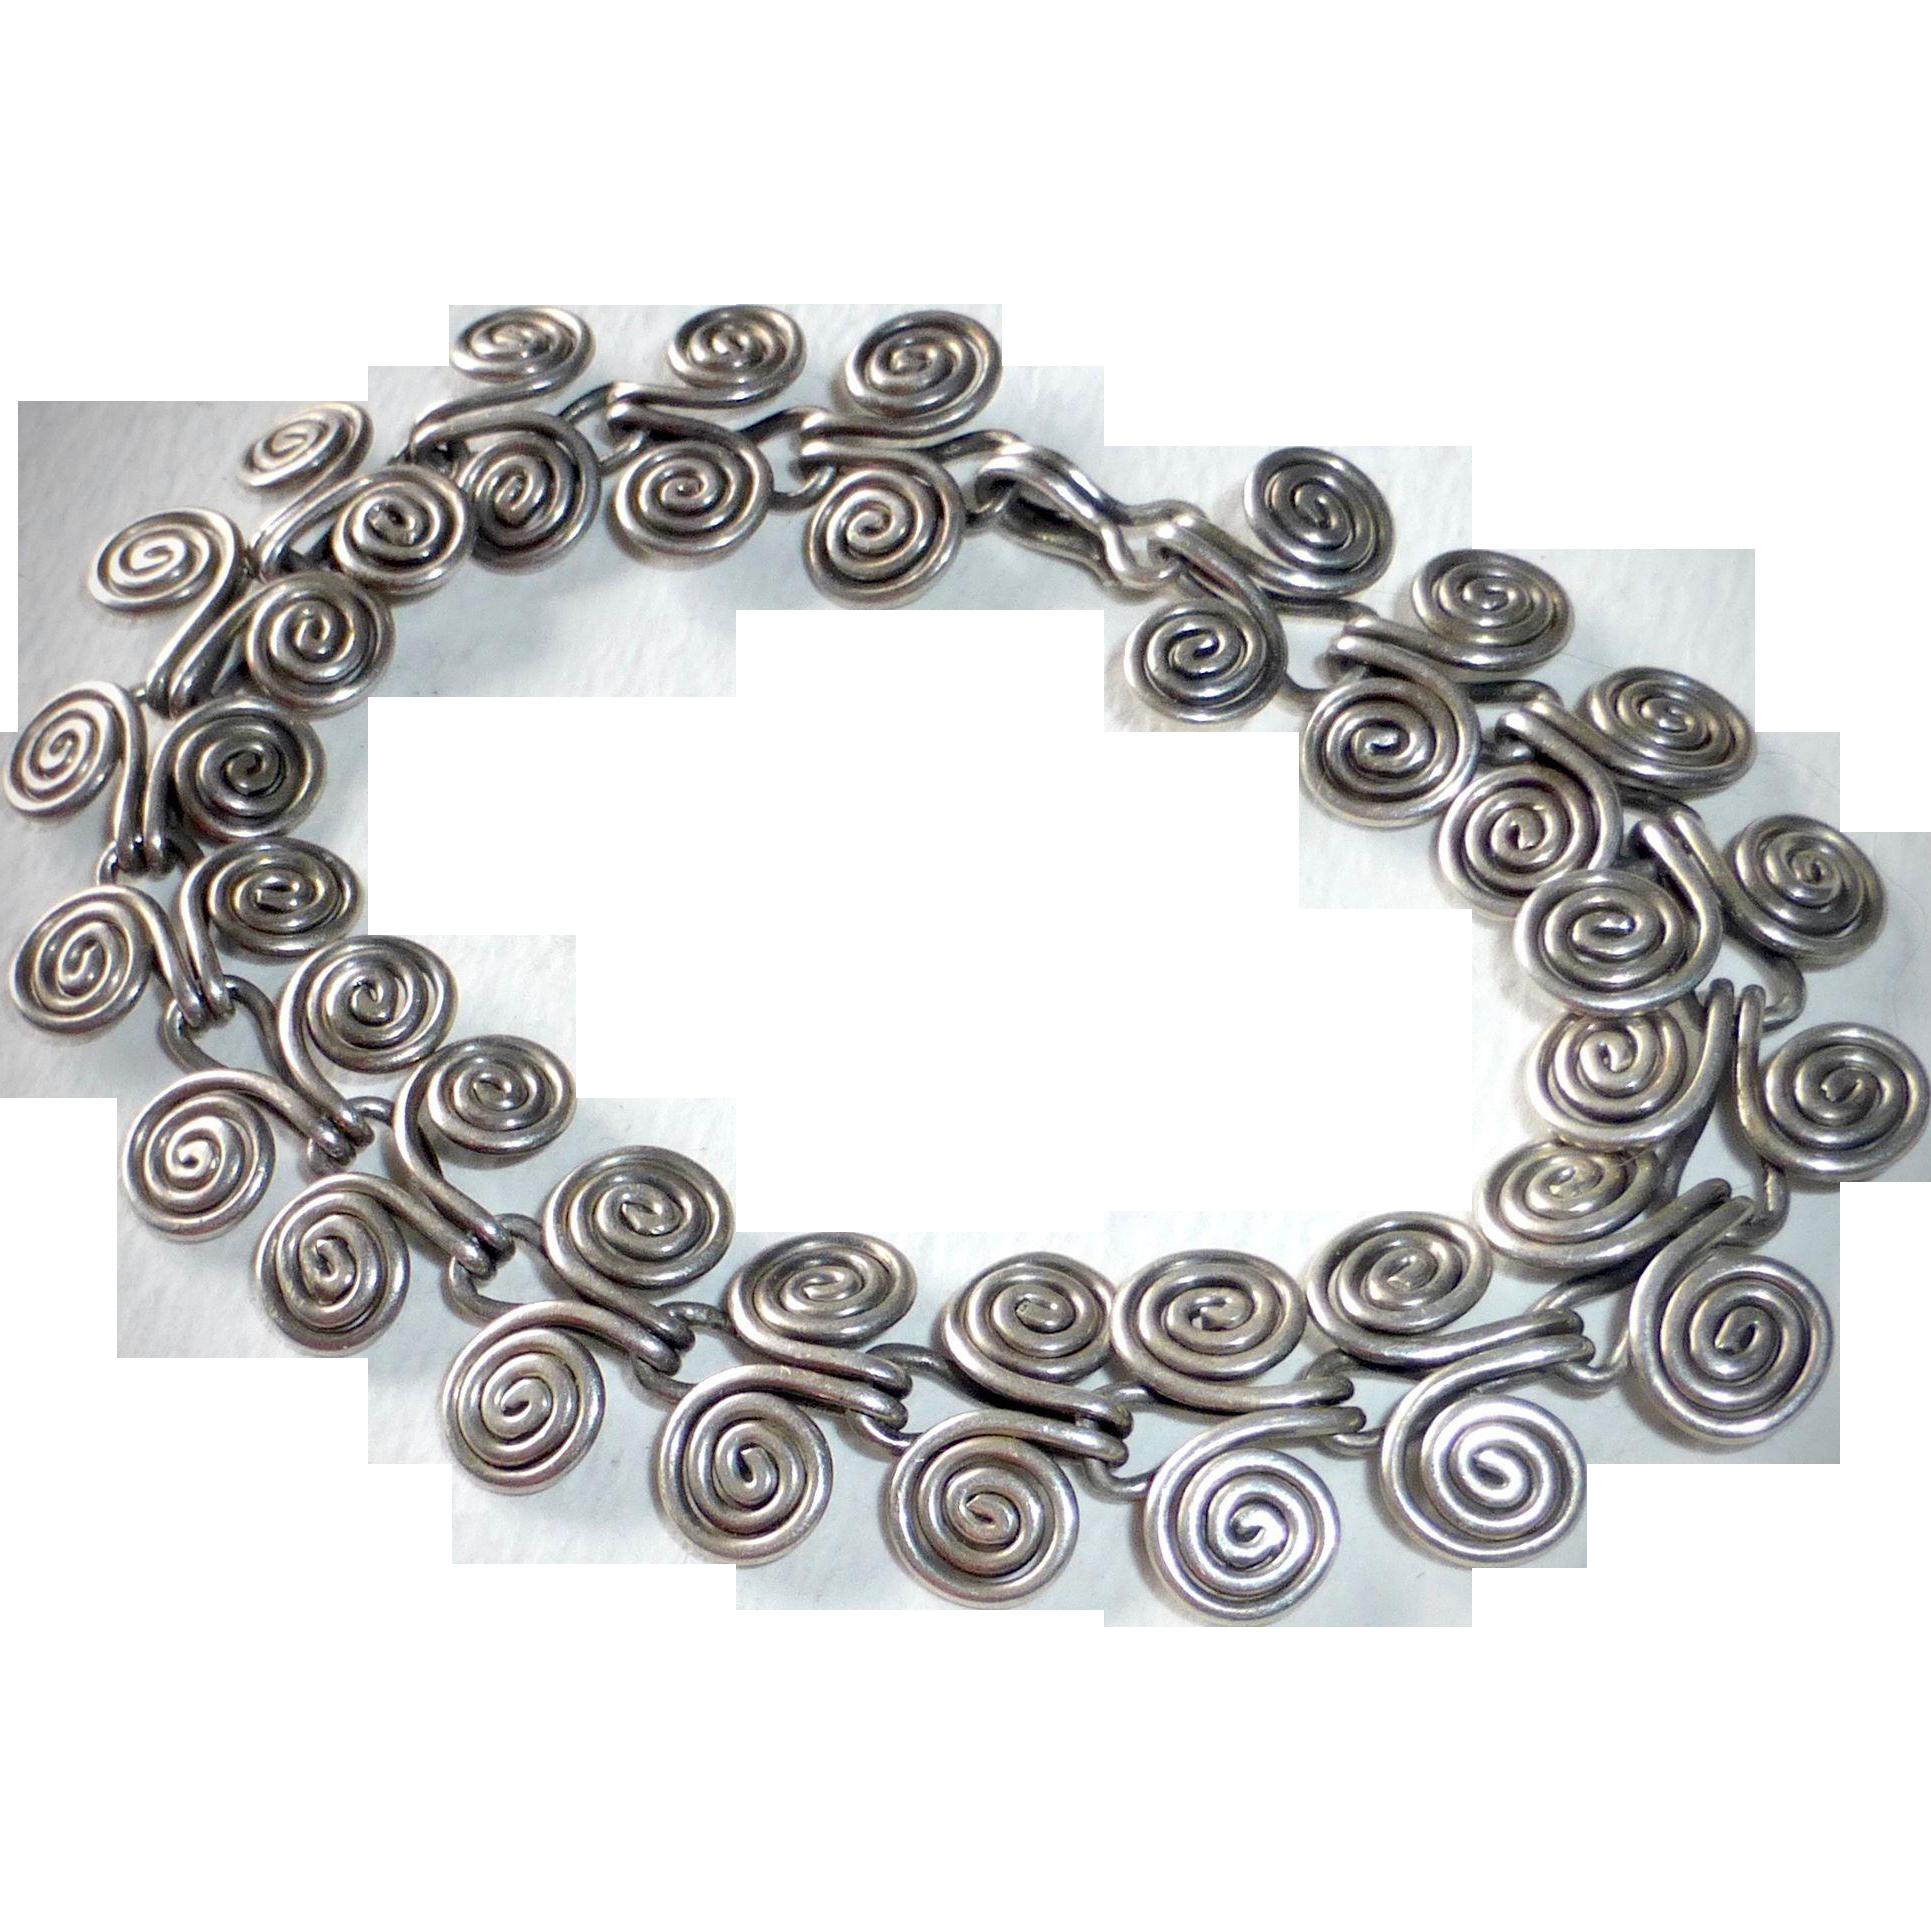 Sterling Silver Handcrafted Double Spiral Slinky Bracelet